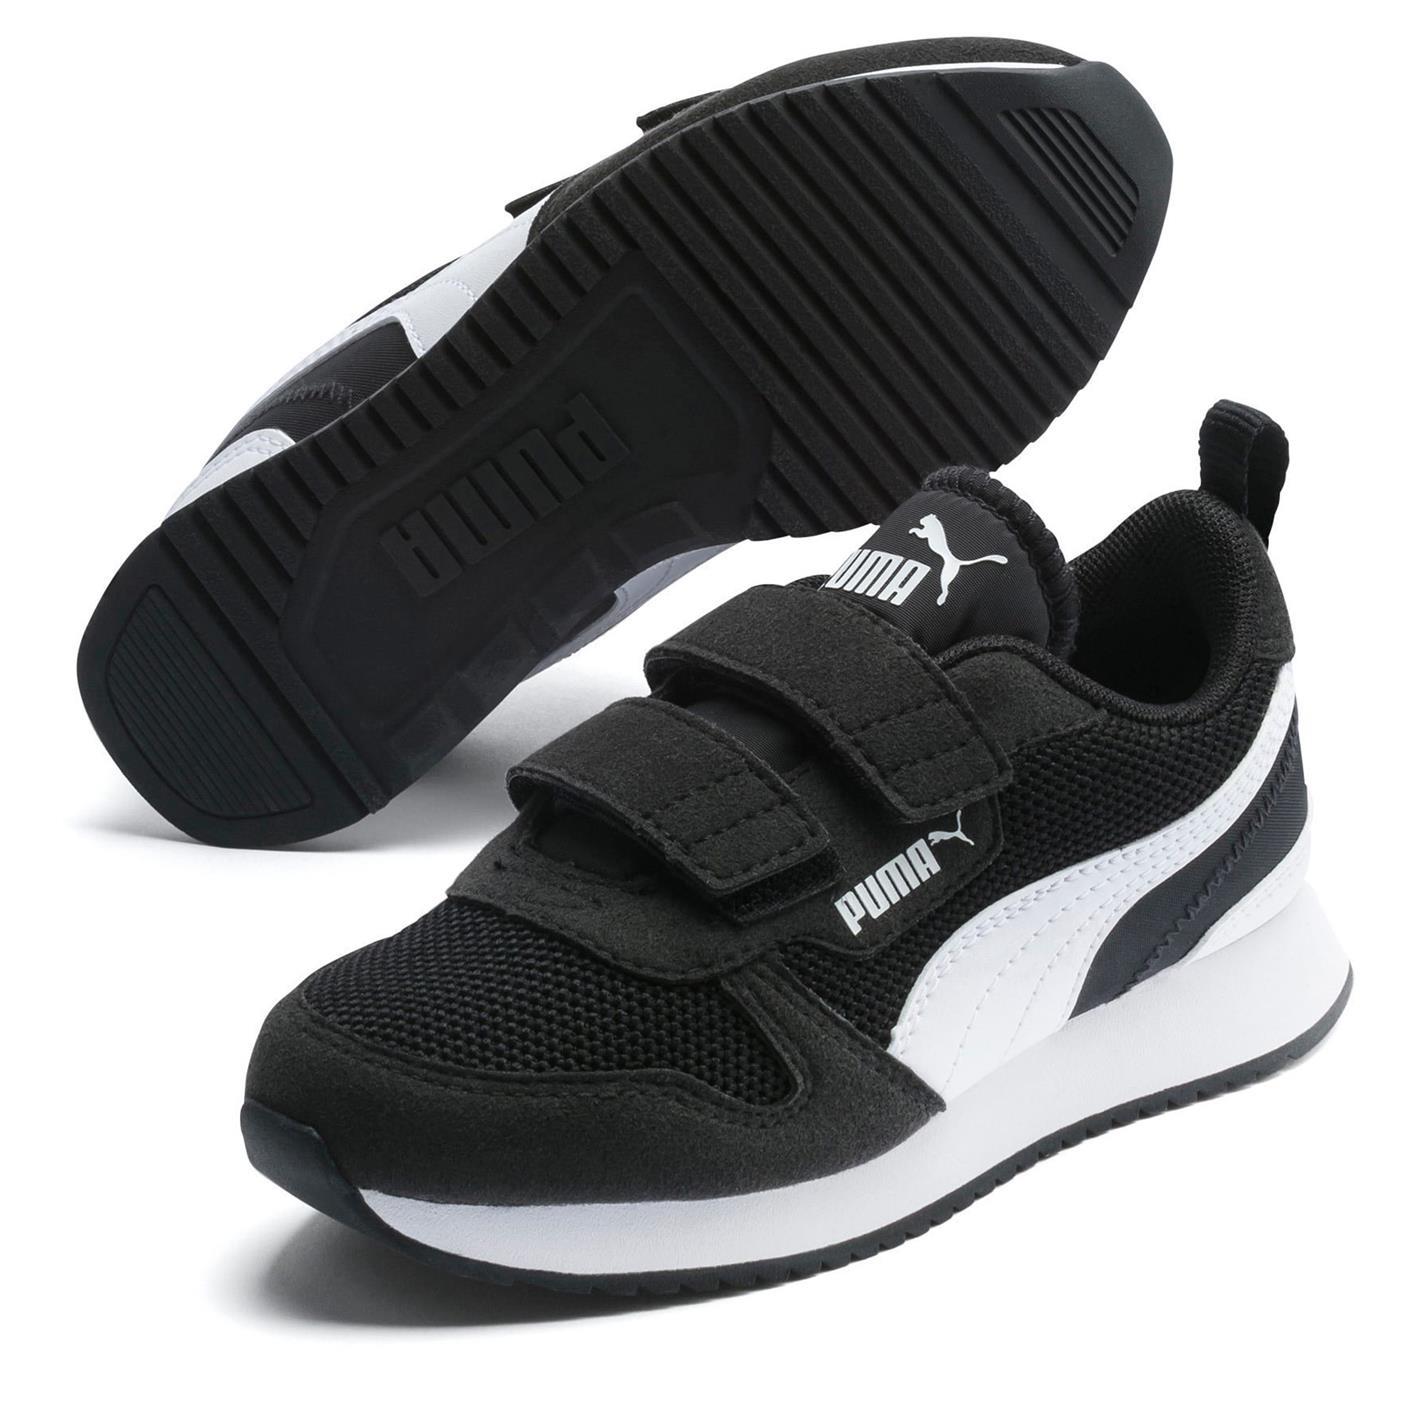 Puma R78 Runner Trainers Child Boys Black/White